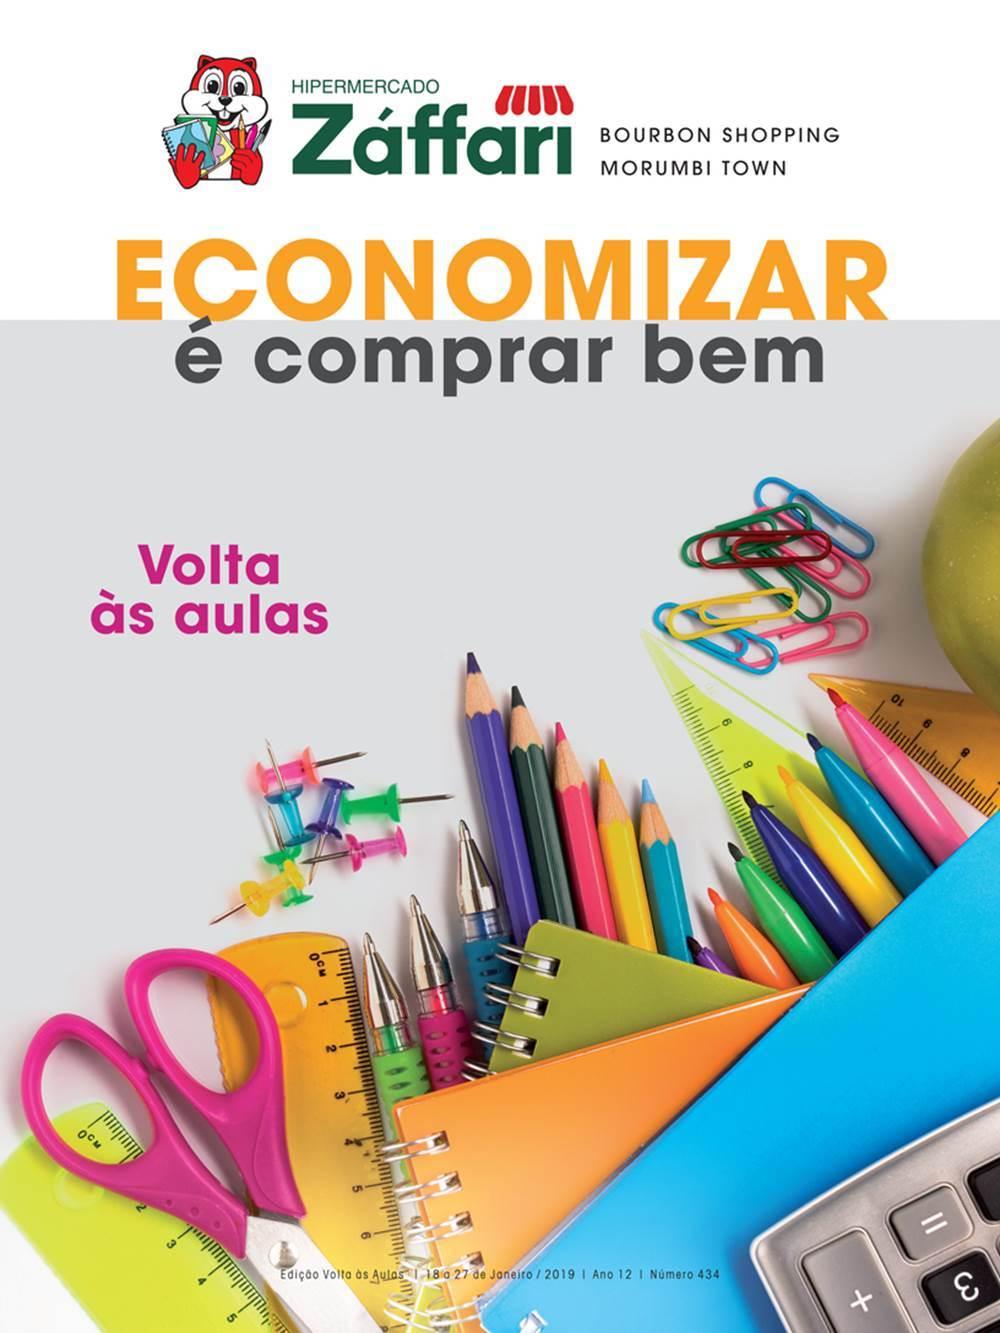 Ofertas-Zaffari1 Ofertas de Supermercados - Economize!